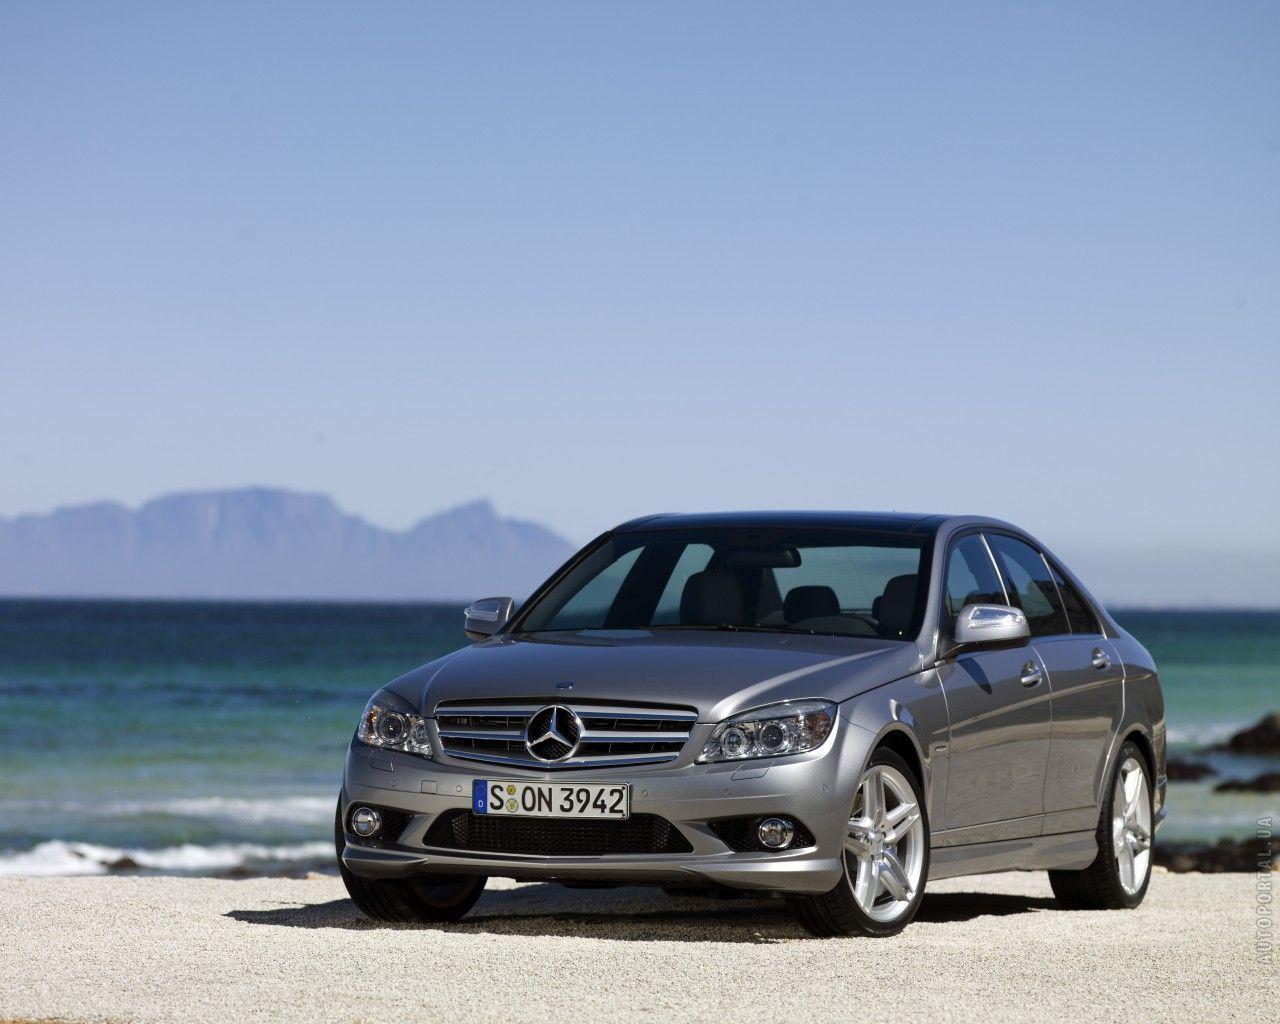 Mercedes-Benz W204 Wallpapers - Top Free Mercedes-Benz ...